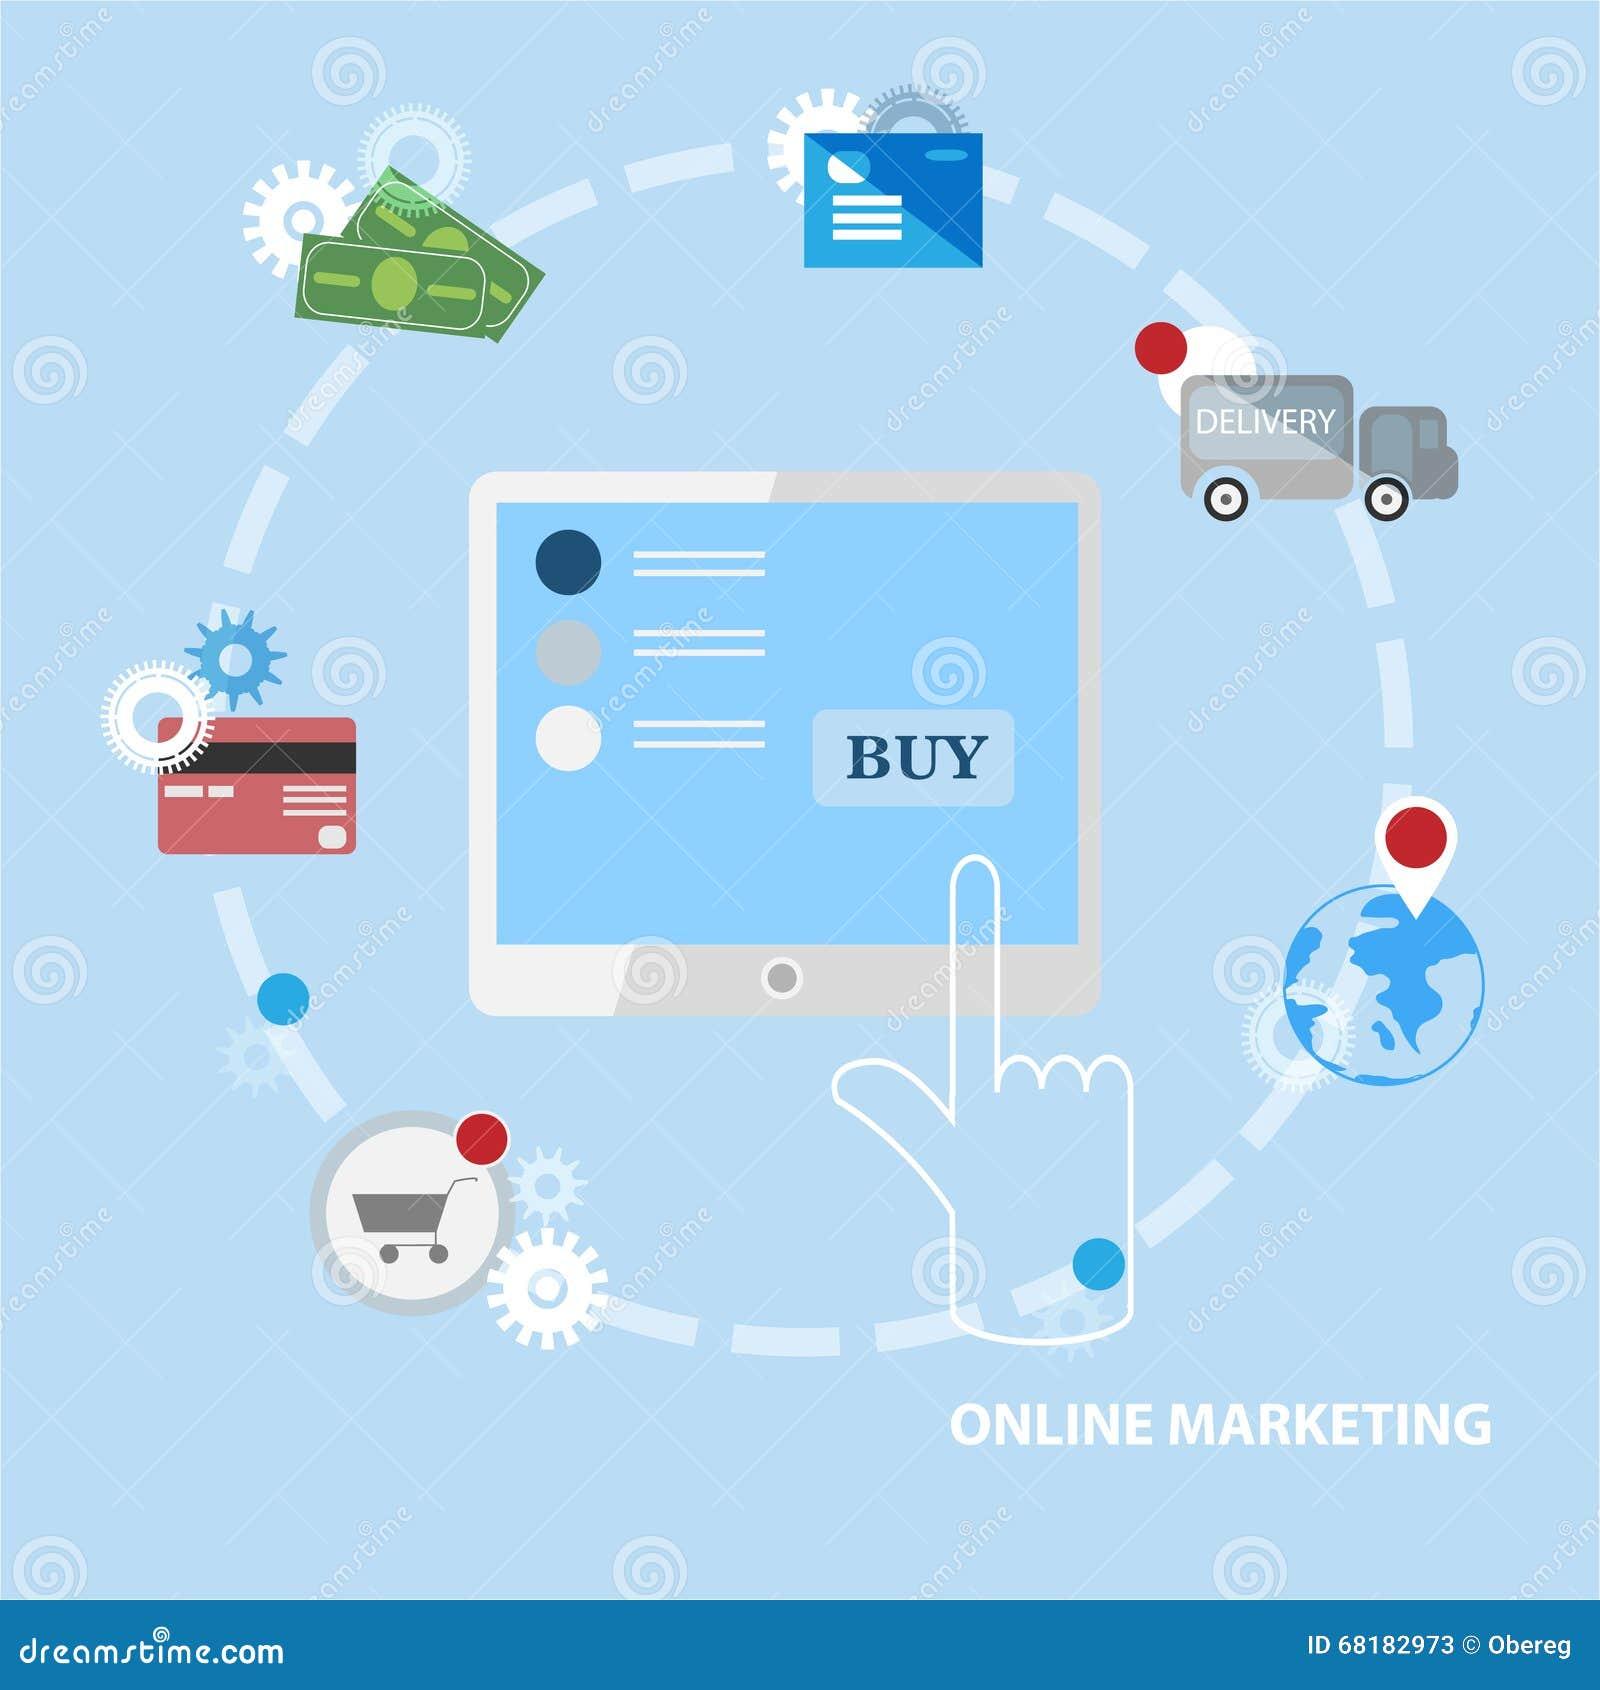 Online marketing business card vector template stock vector online marketing business card vector template colourmoves